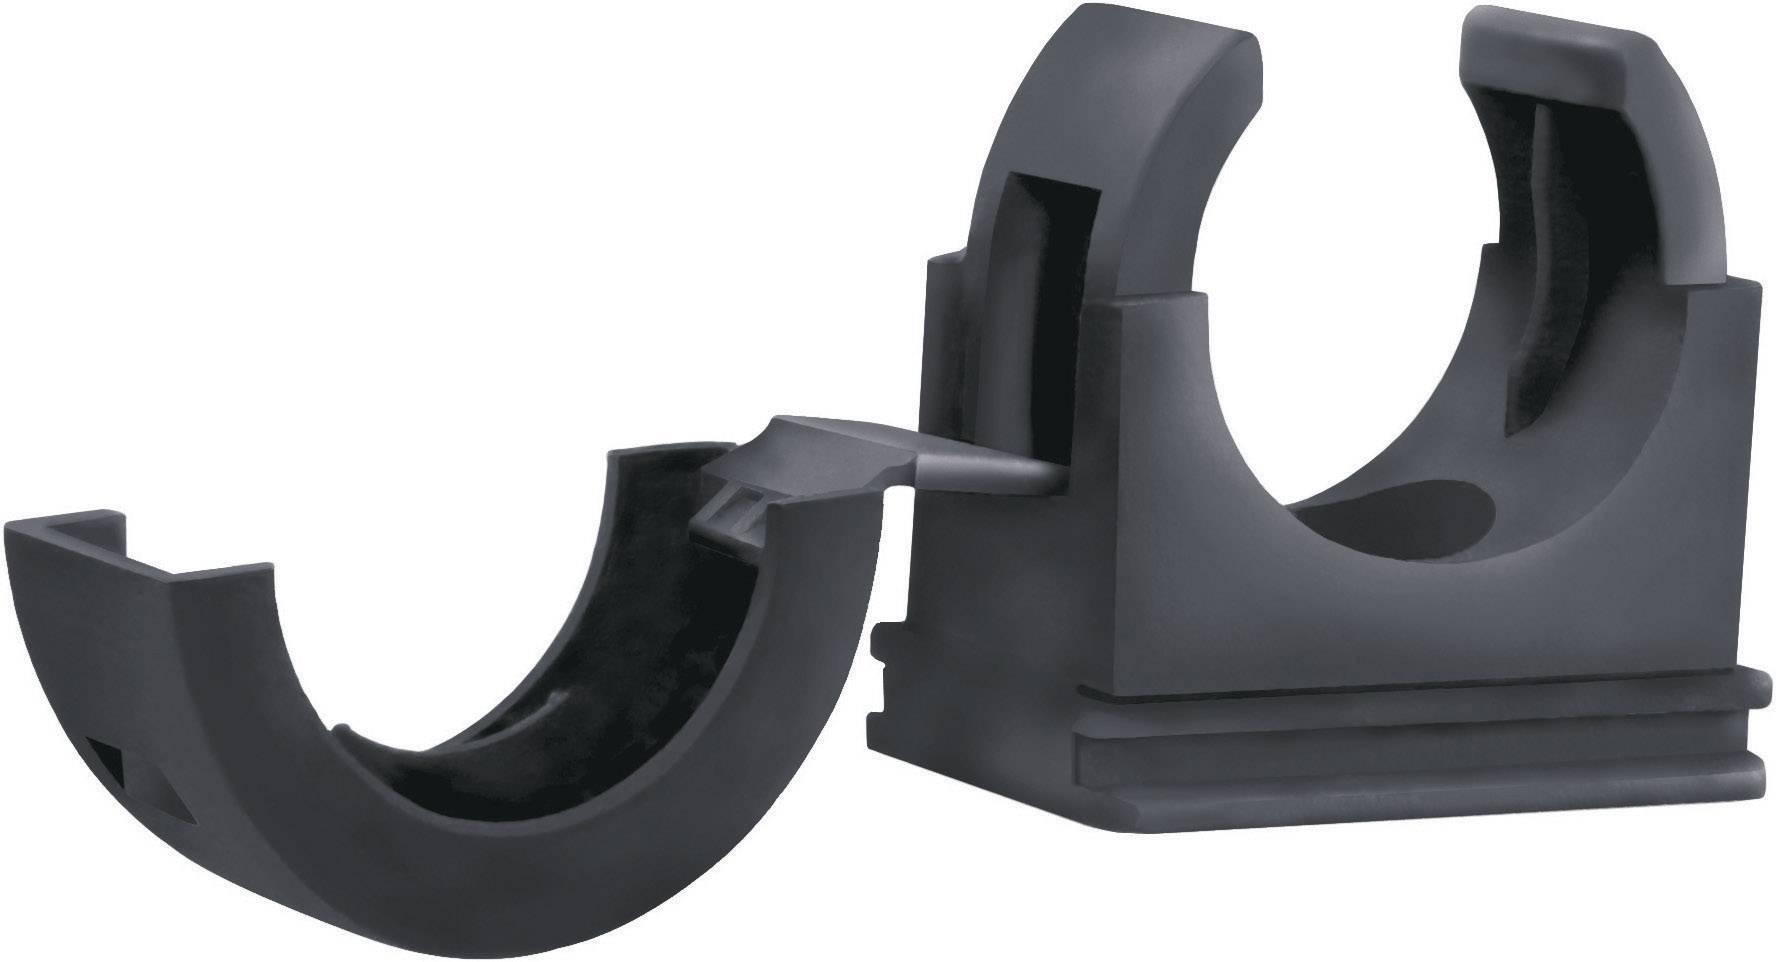 LappKabel SILVYN® FCL 13 55506915, 9.80 mm, čierna, 1 ks